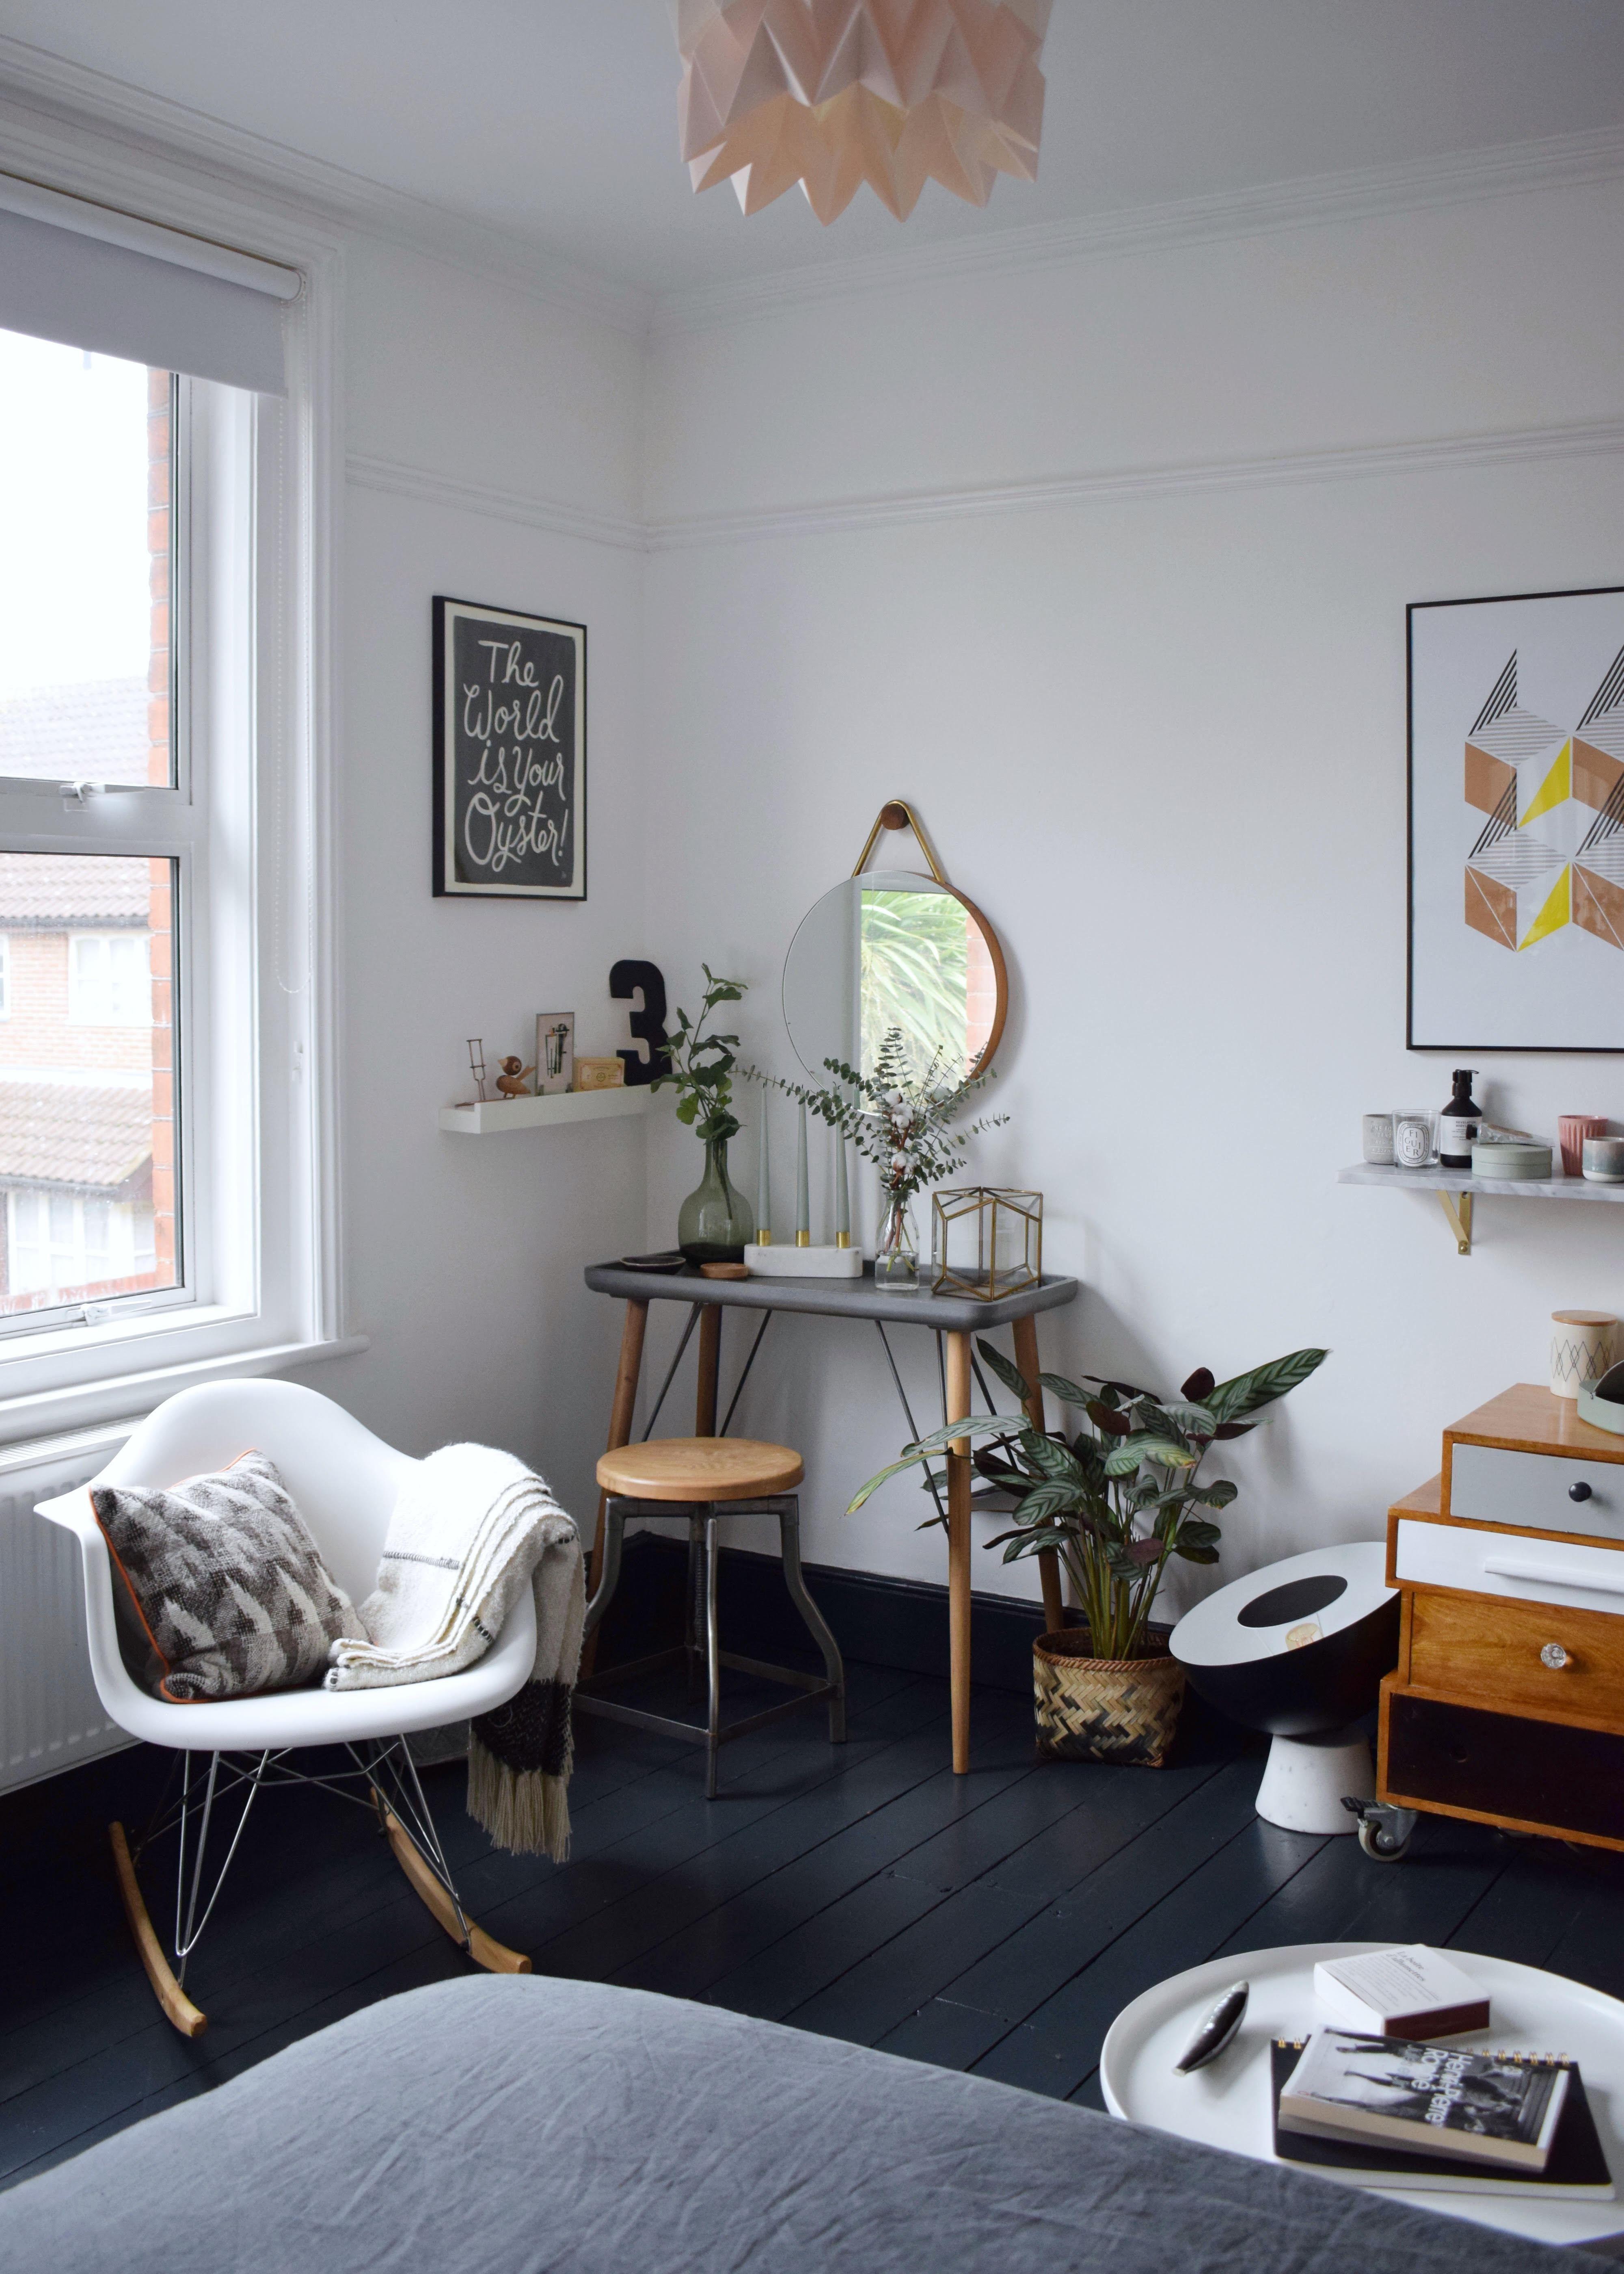 Warren Evans Tempur Matress Tips For A Good Nights Sleep Glamorous Monochrome Bedroom Design Ideas Inspiration